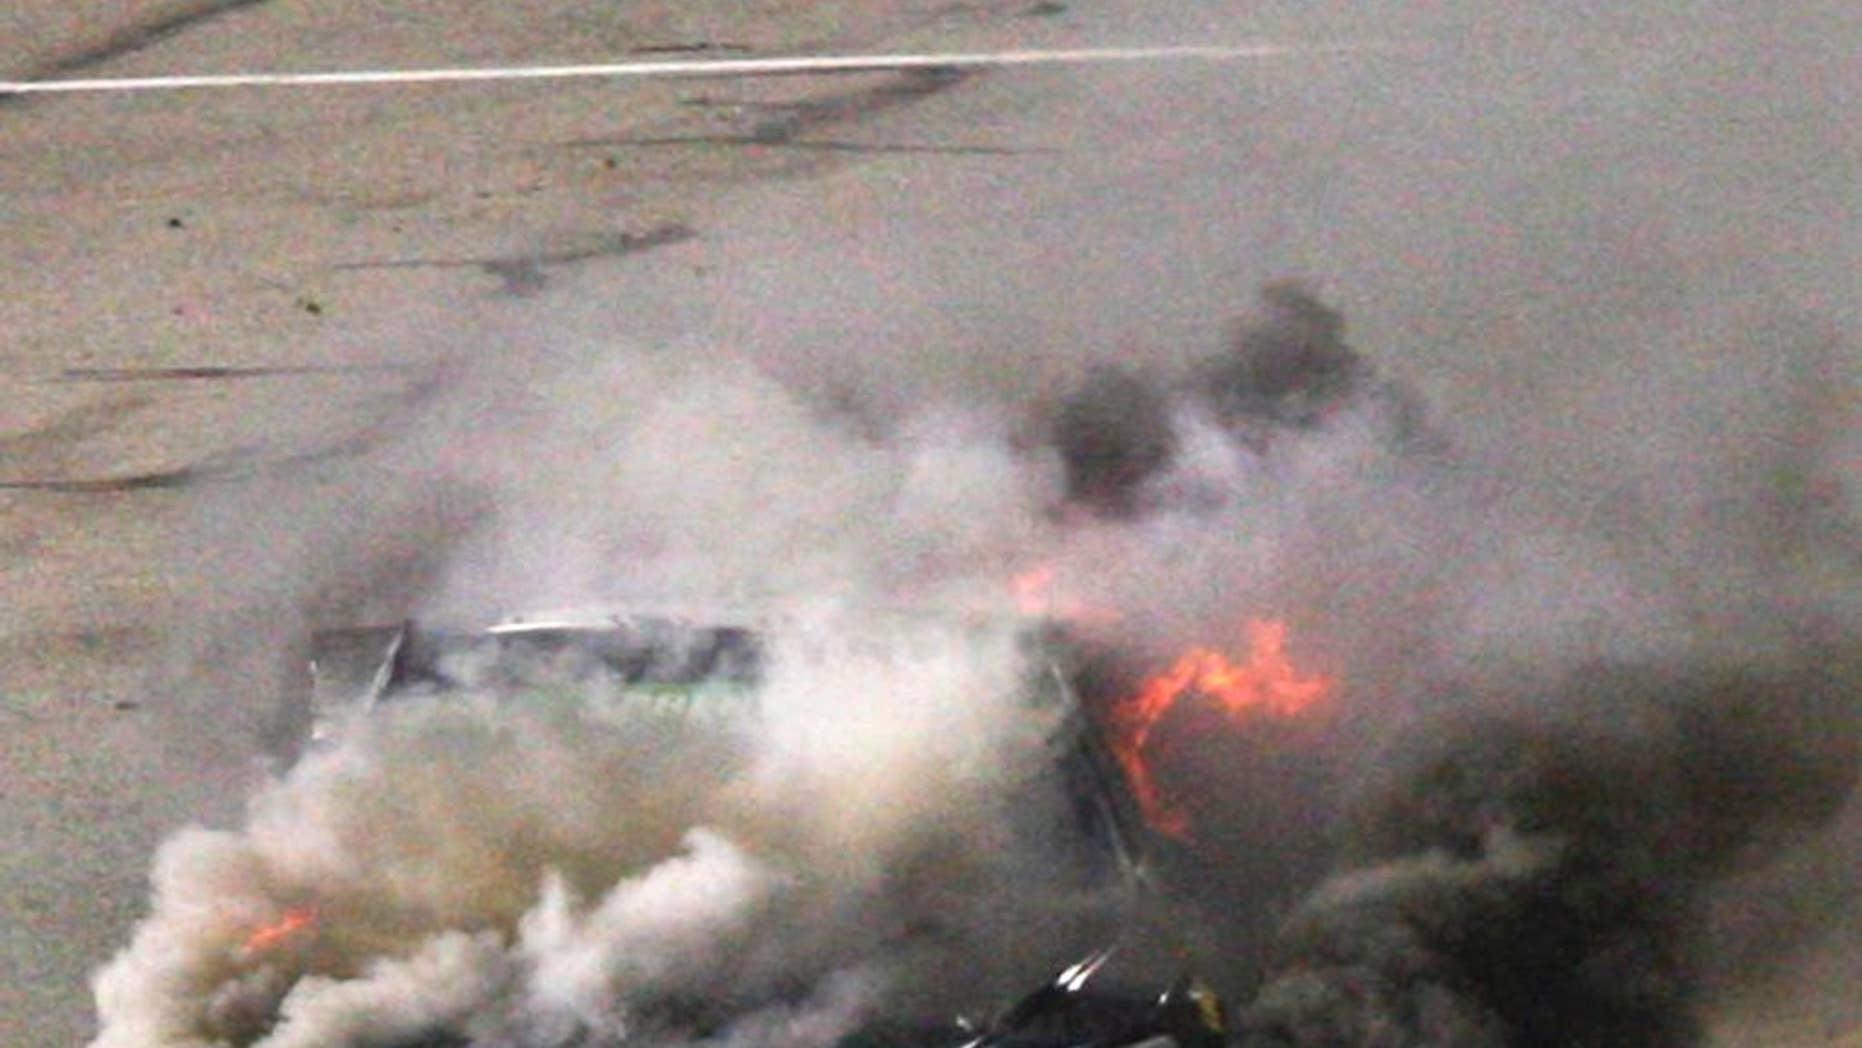 Reed Sorenson's car burns on pit row during the NASCAR Sprint Cup auto race at Richmond International Raceway in Richmond, Va., Saturday April 26, 2014. (AP Photo/Richmond Times-Dispatch, Dan Currier)